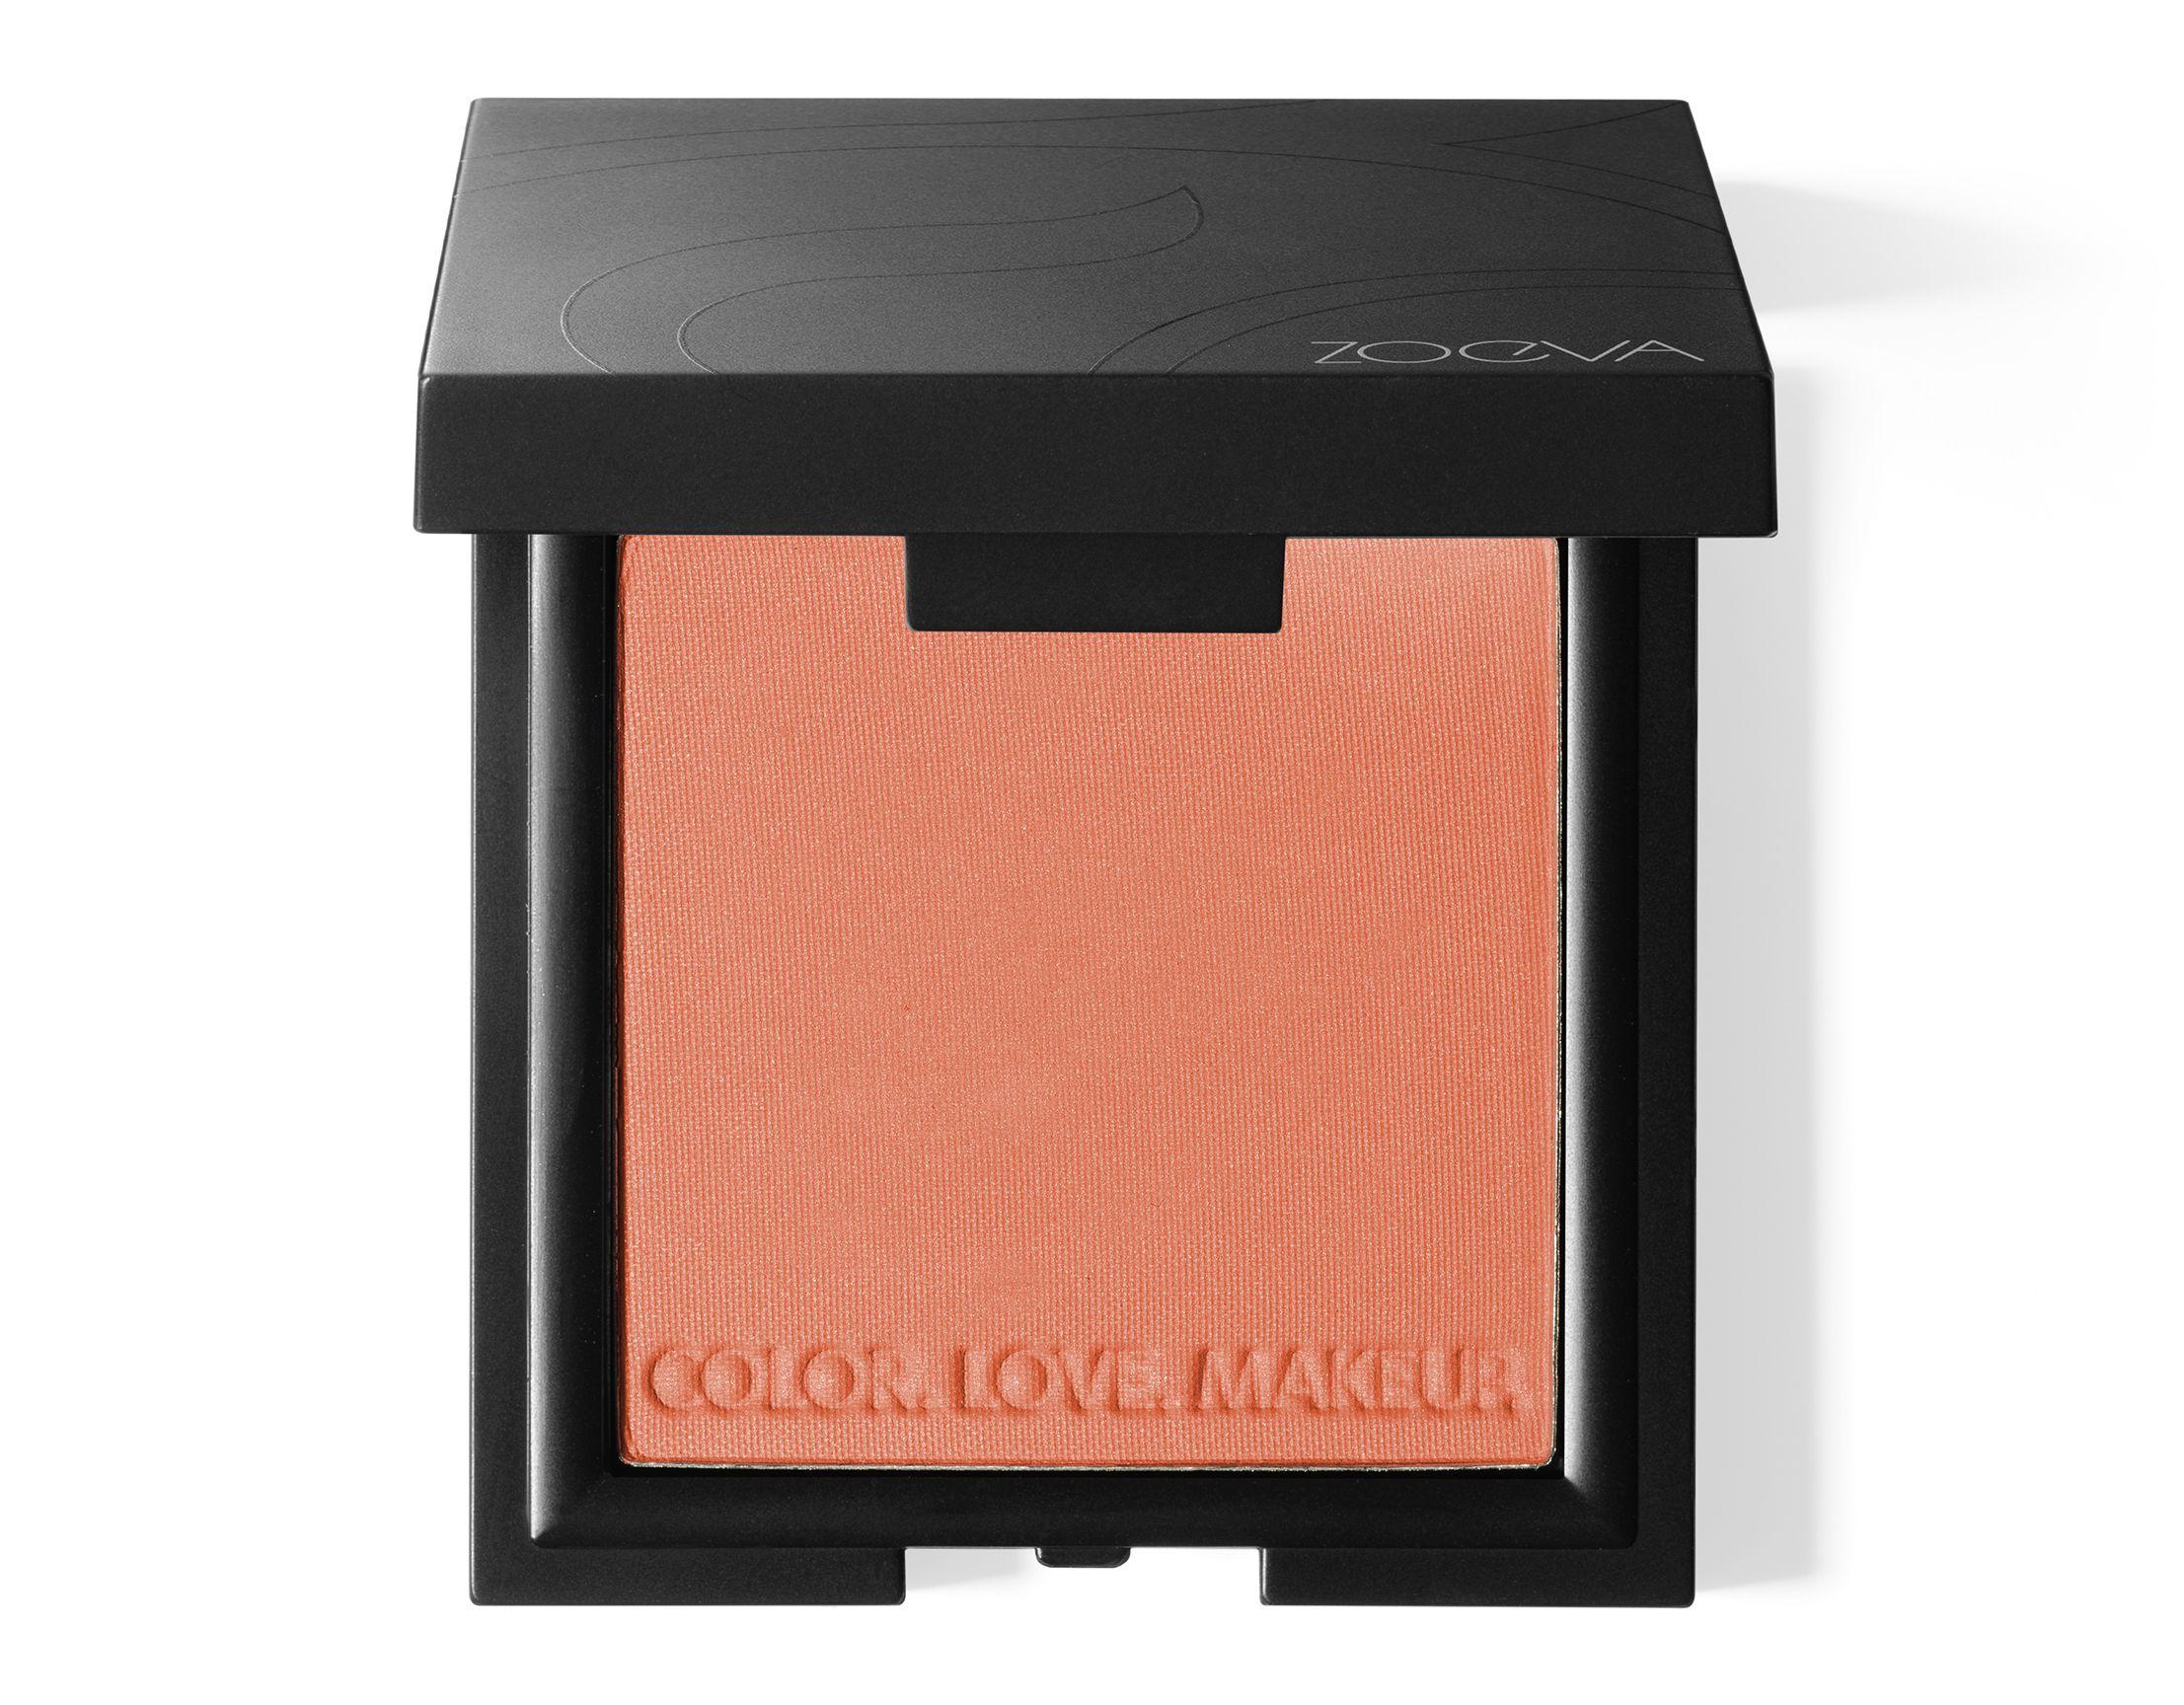 ZOEVA Luxe Color Blush Last Love // Peach color with a subtle golden shimmer // https://www.zoeva-shop.de/en/face/cheek/luxe-color-blush/luxe-color-blush-last-love/a-8000350/